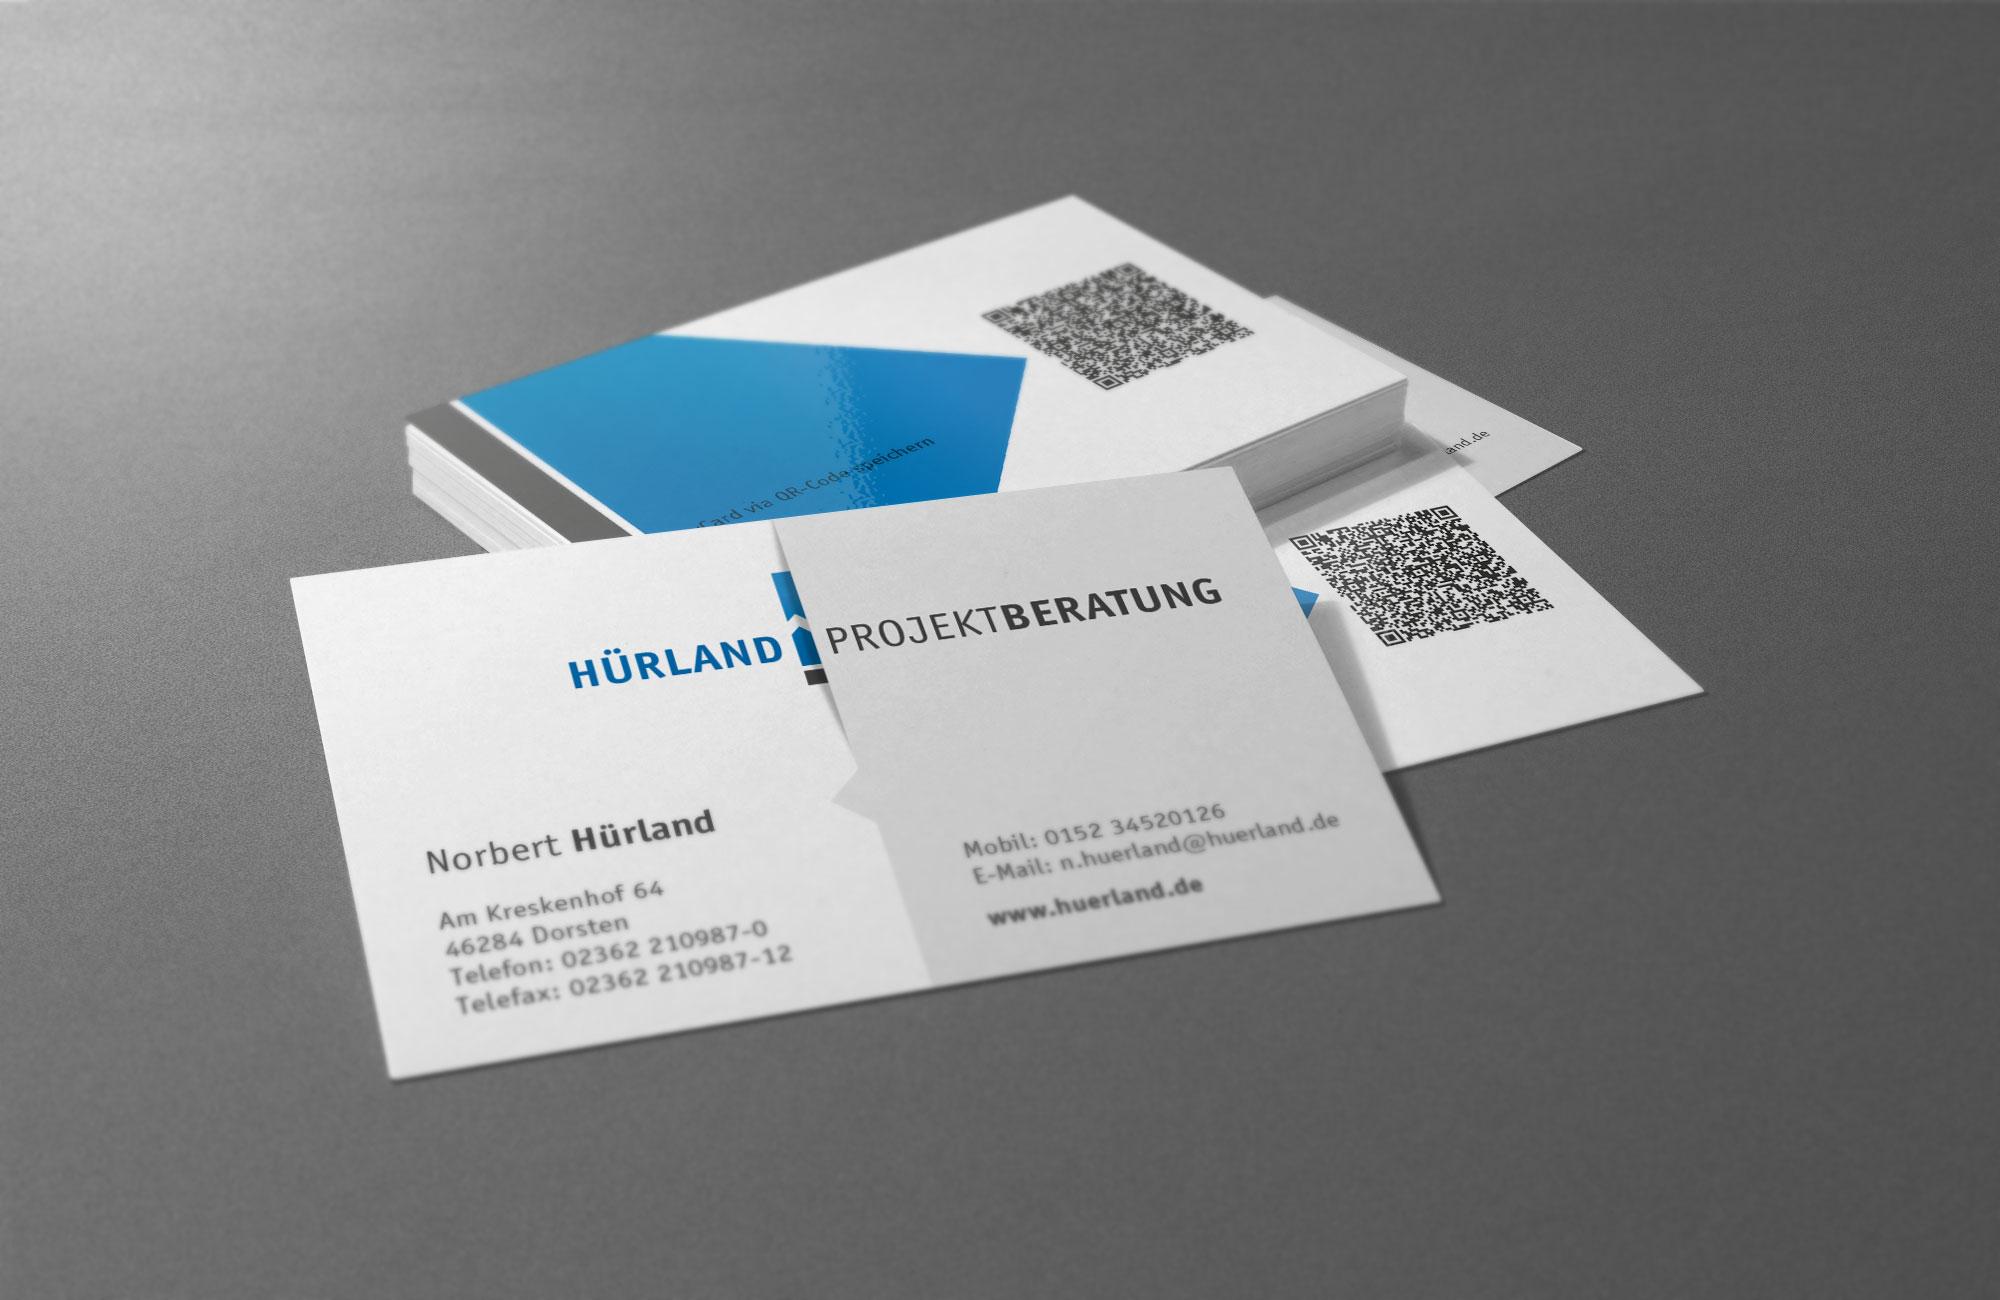 Hürland Projektberatung